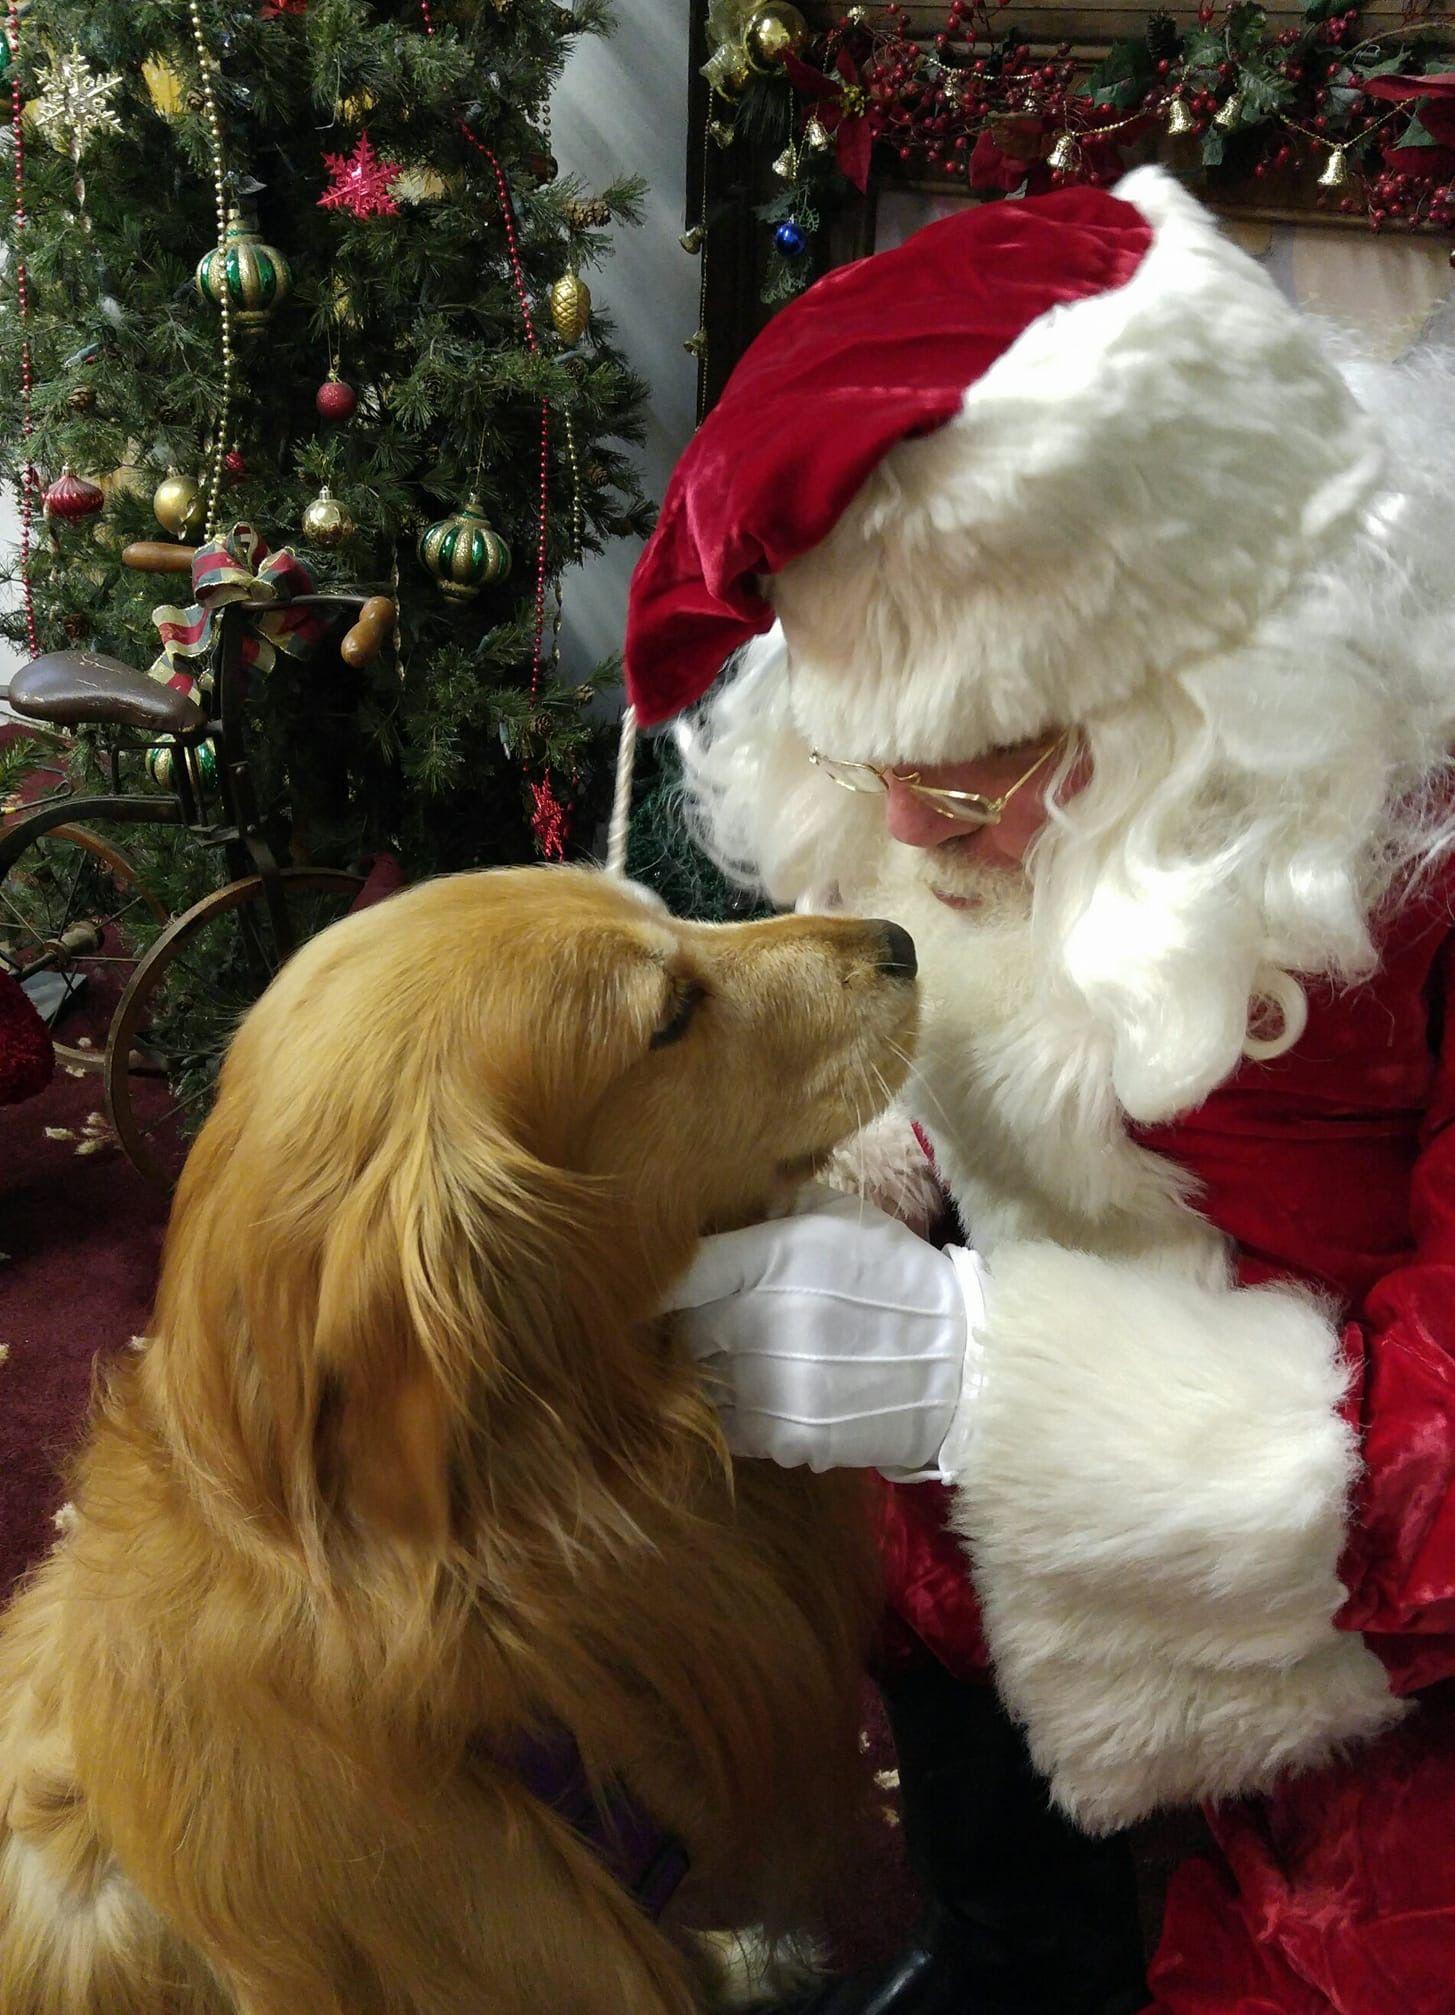 Sweet Golden Retriever And Santa Claus Christmas Puppy